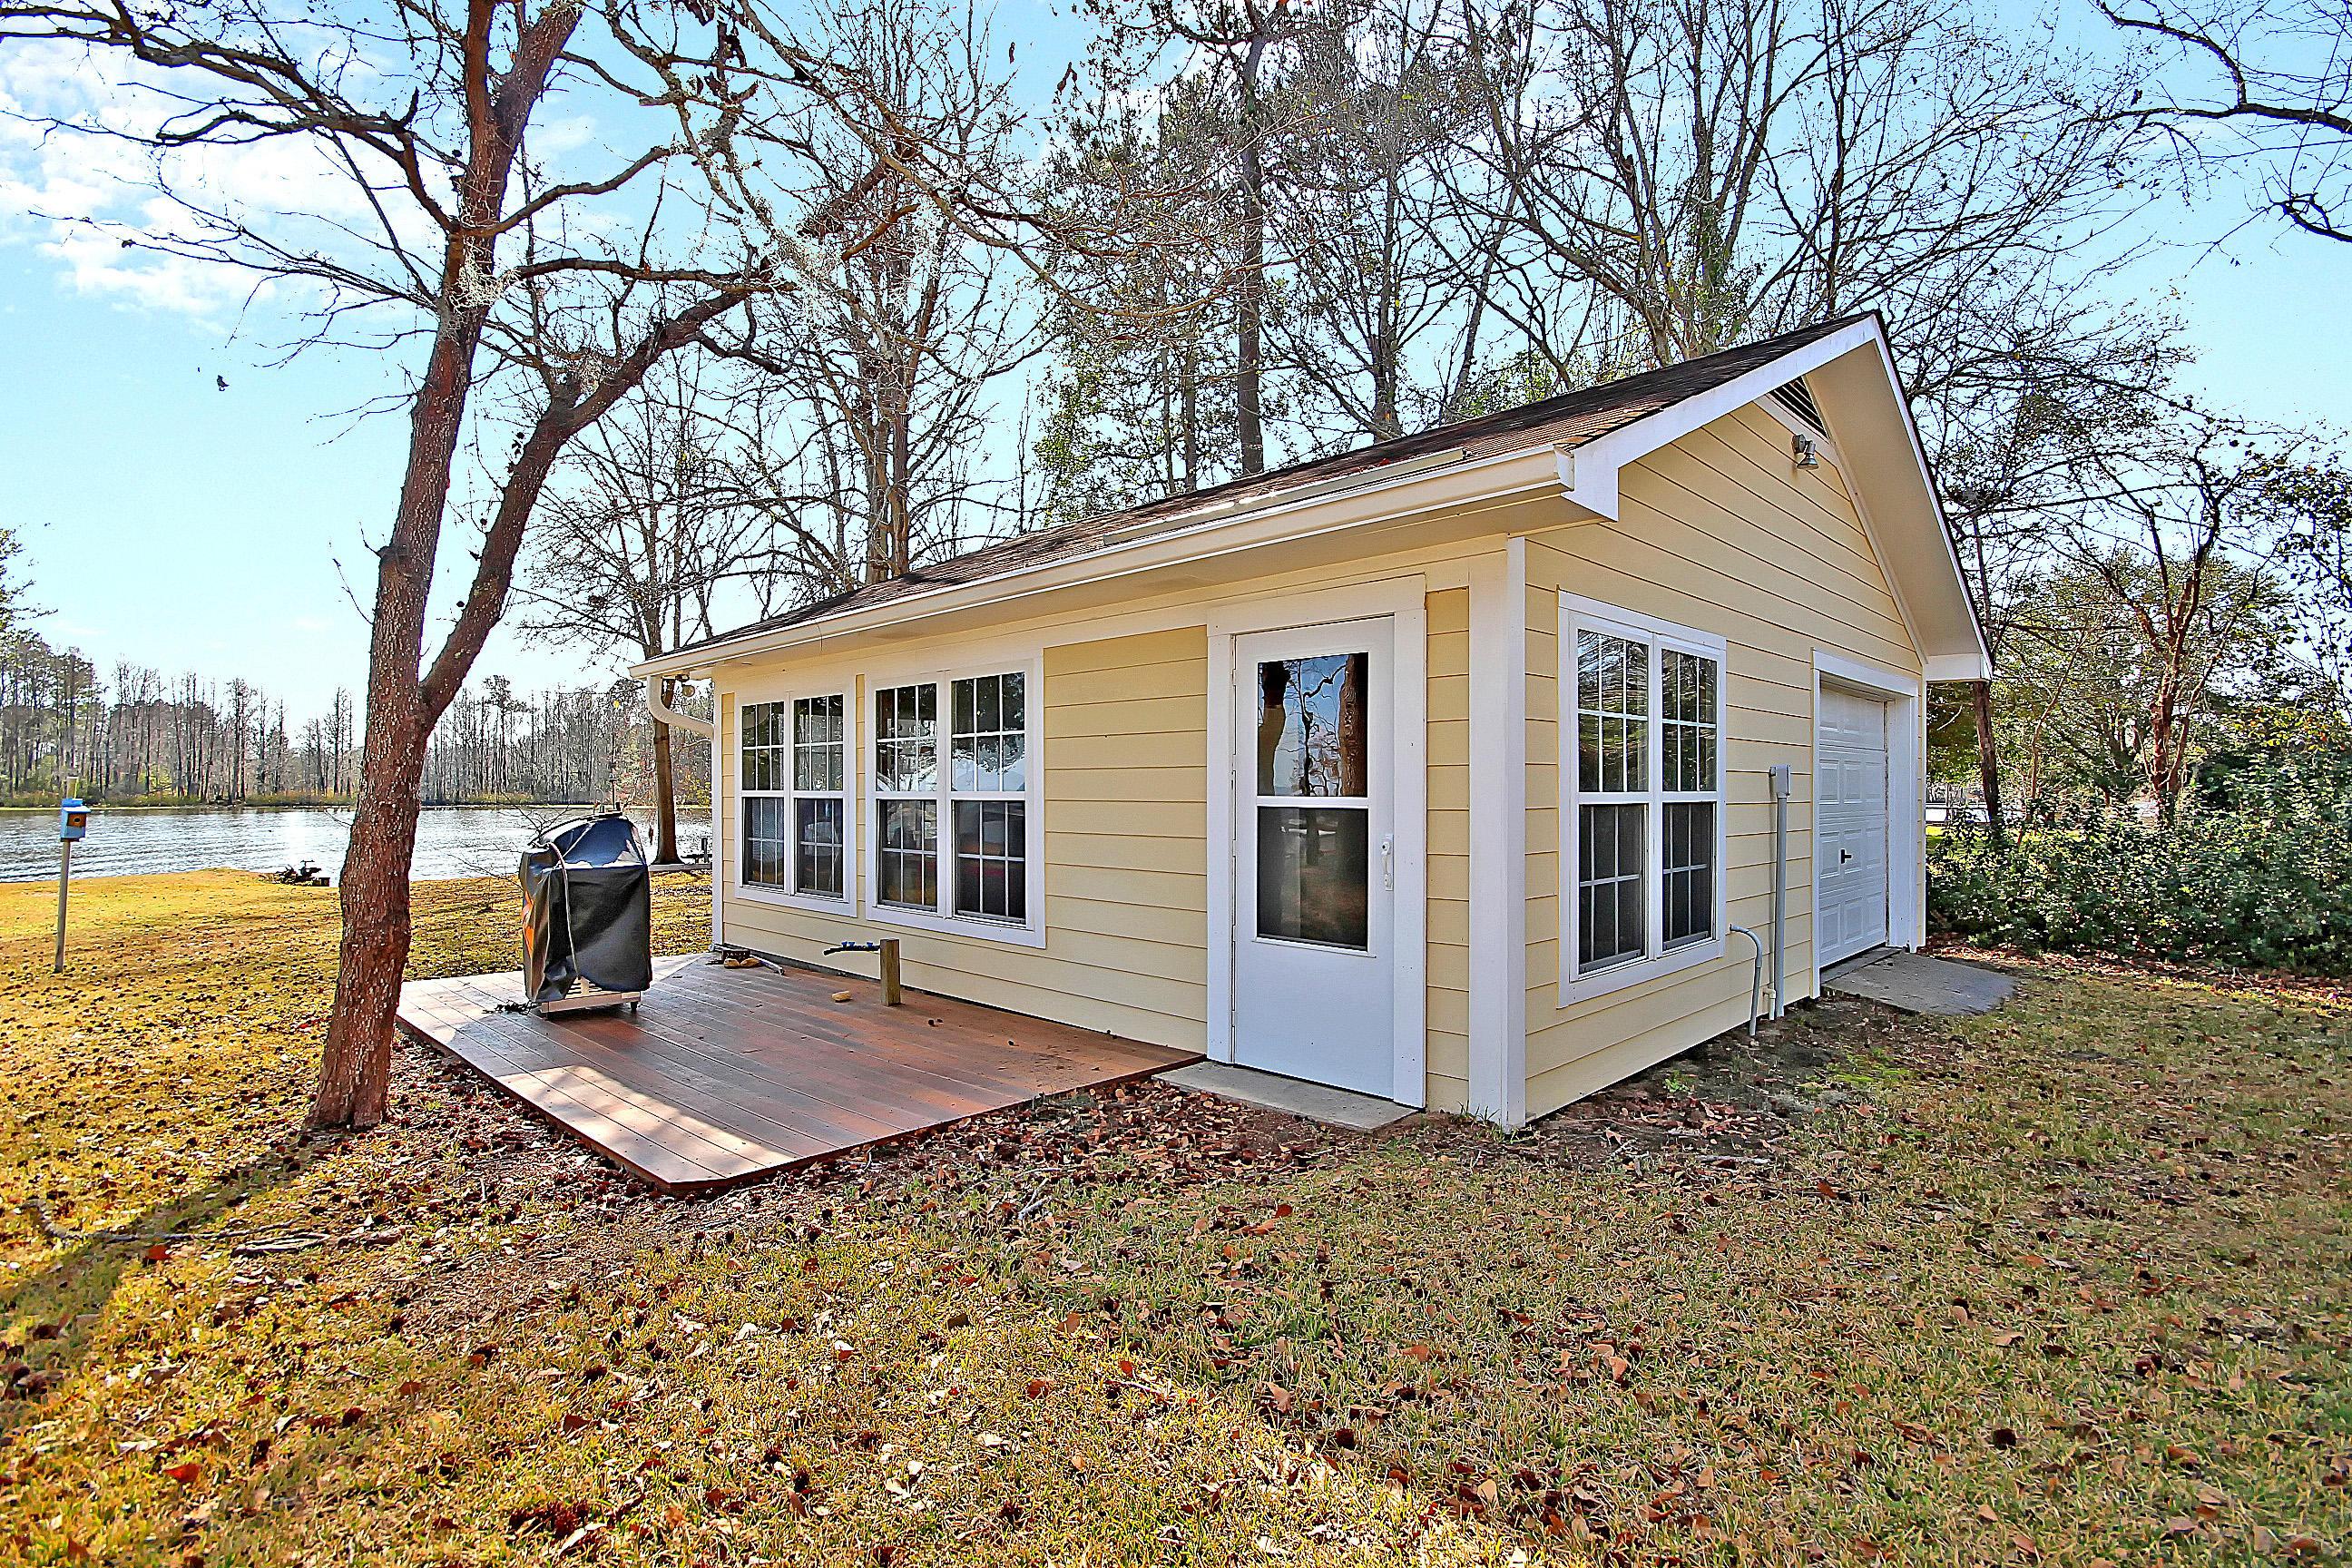 Cross Subd (Longpoint) Homes For Sale - 1191 Longpoint, Cross, SC - 40